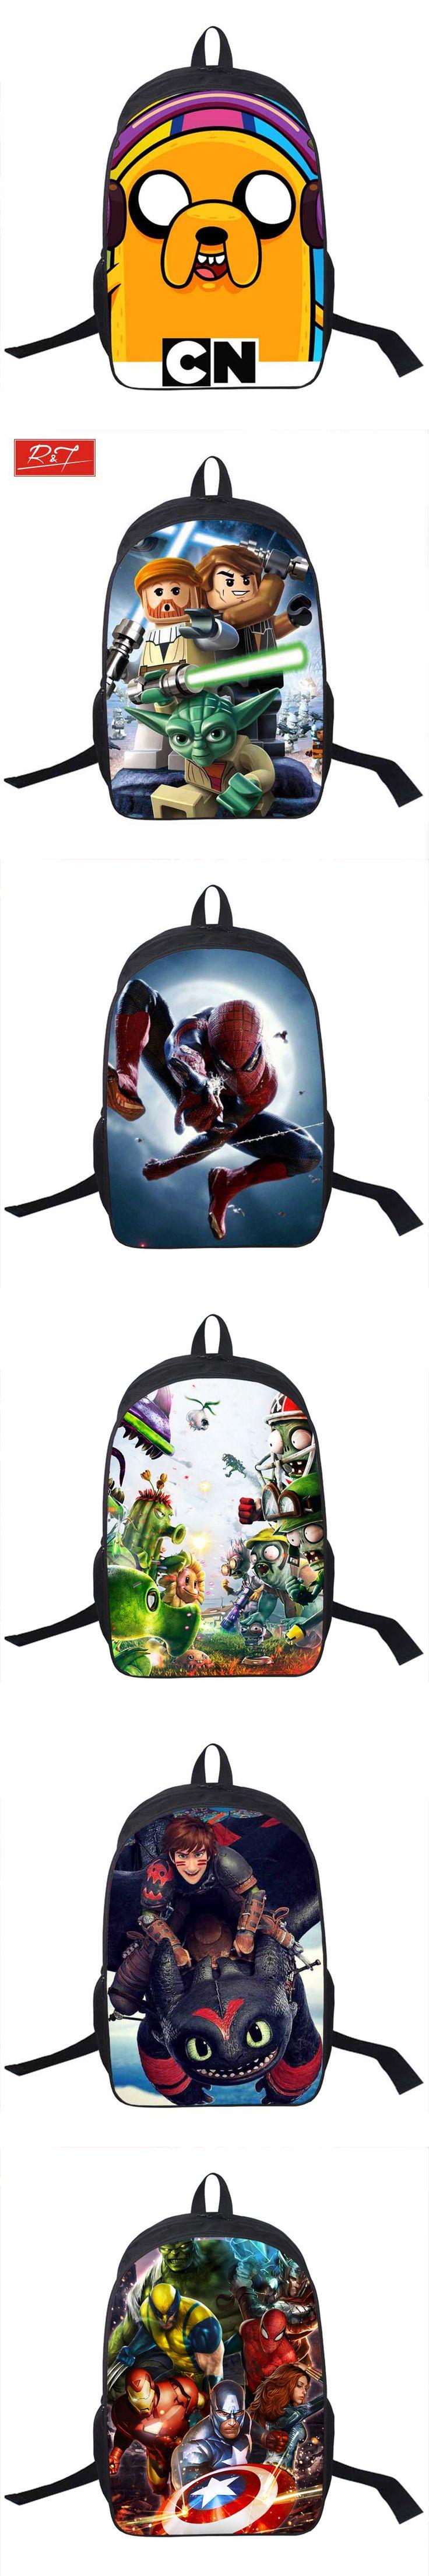 Young Men Star Wars Bag Anime Adventure Time Backpack For Teens Boys Hero Batman Spiderman Bag kids School Bags Daily Backpacks $27.82